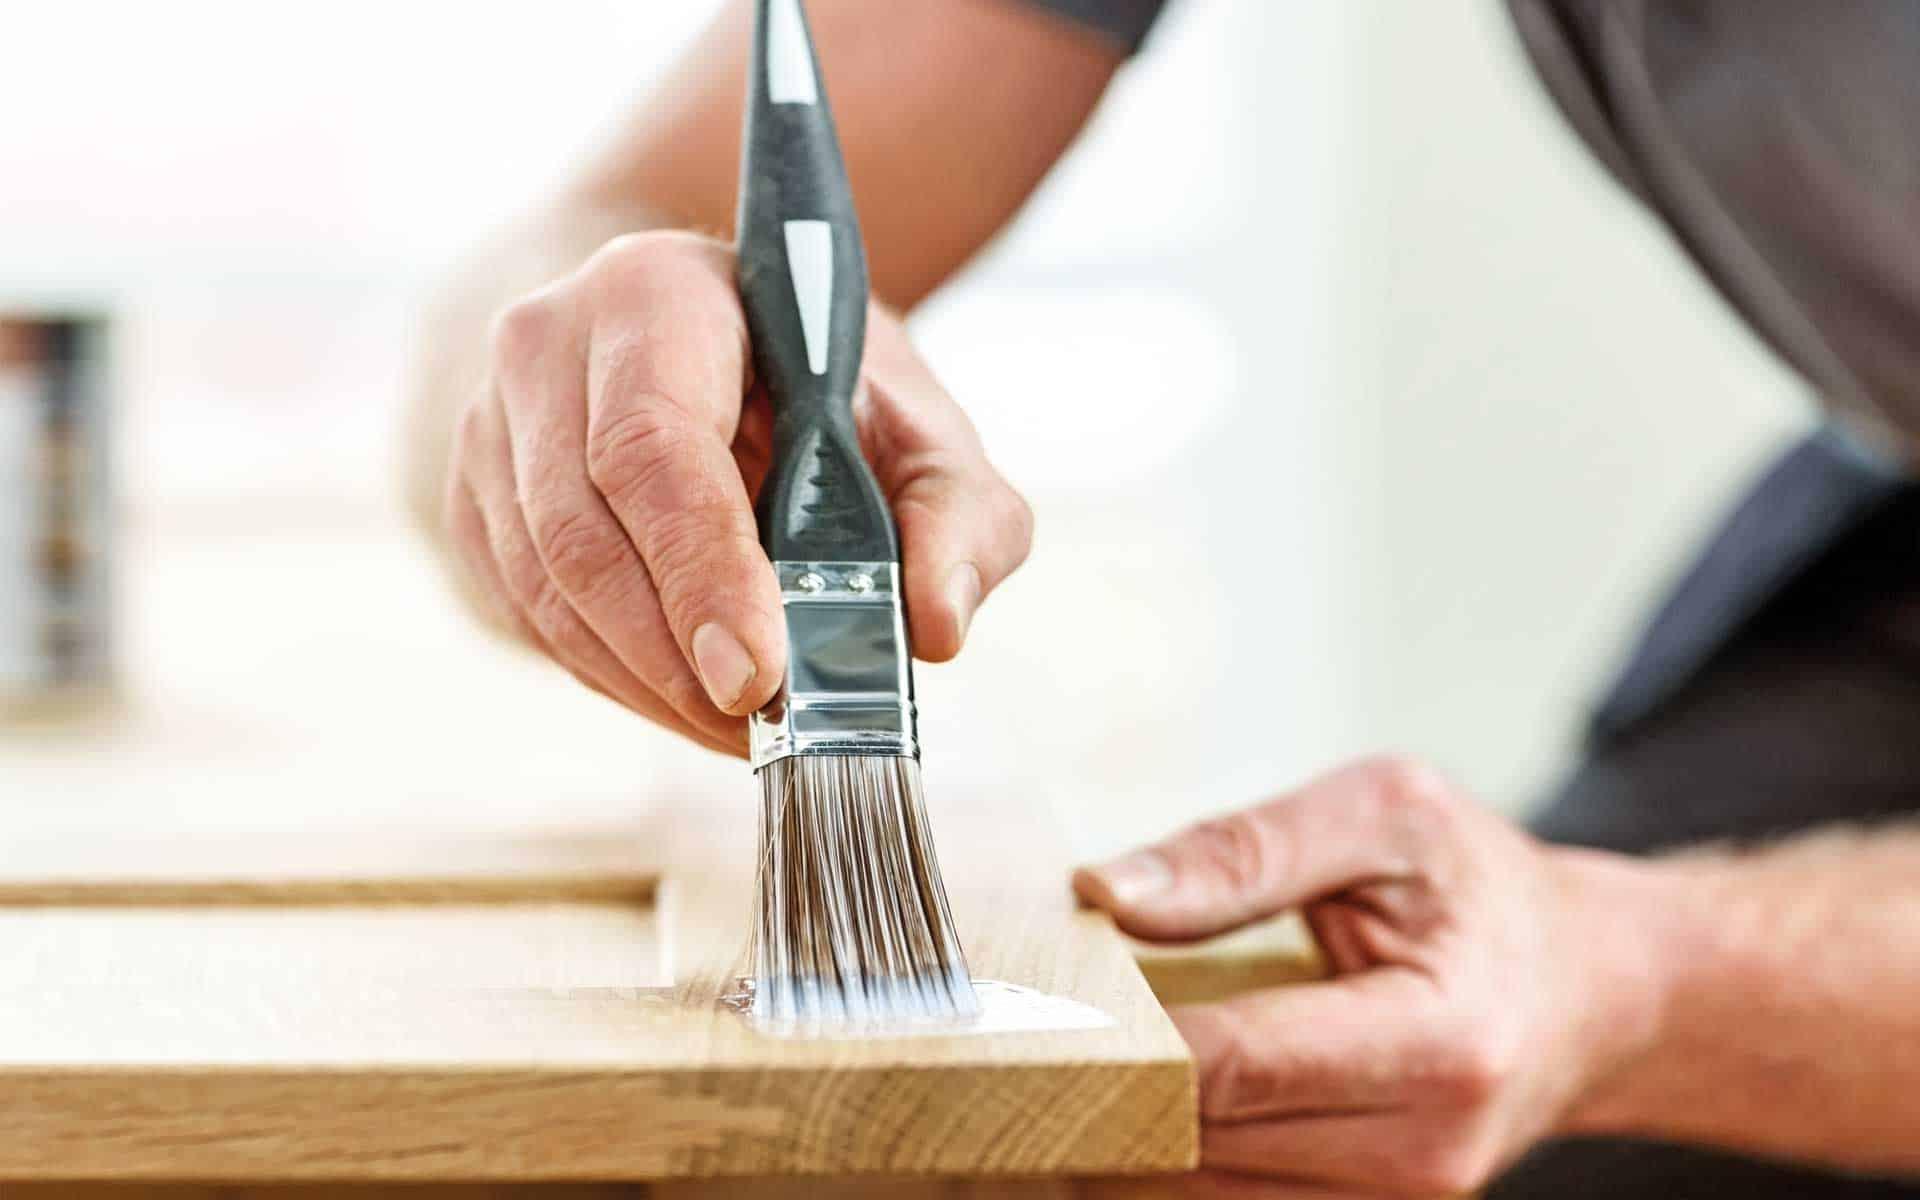 Hirnholz bearbeiten